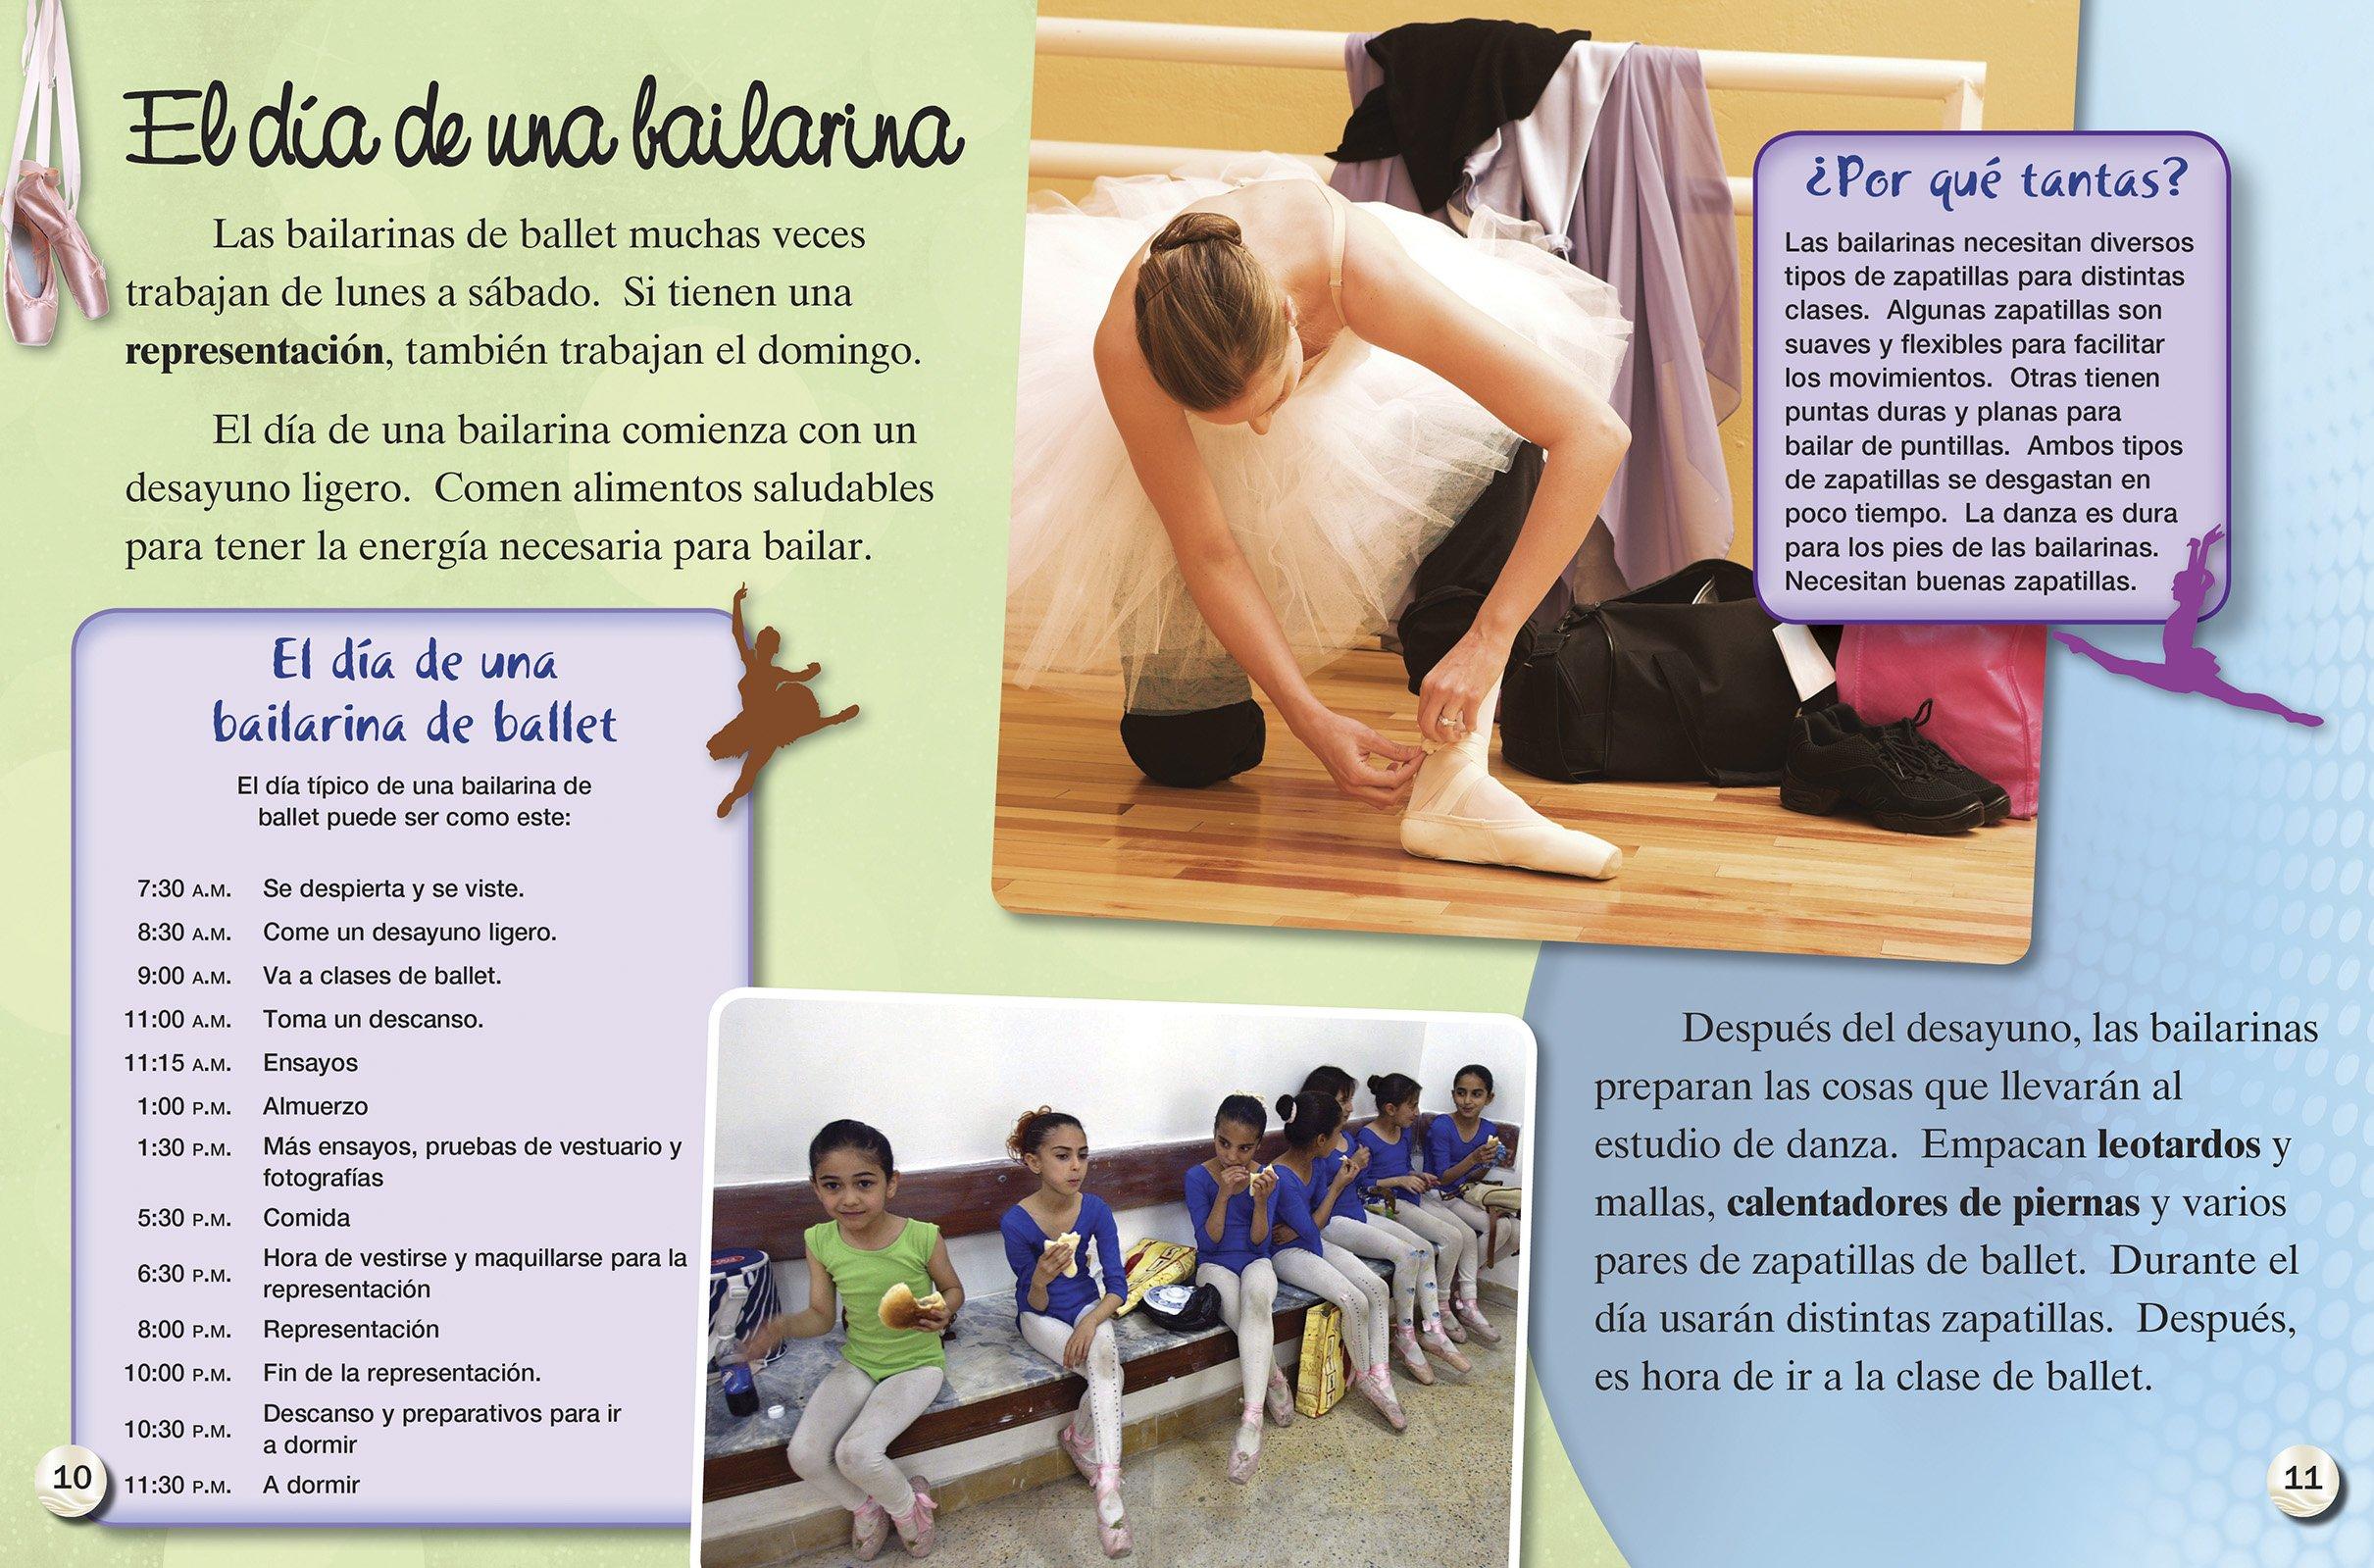 Amazon.com: Un día en la vida de una bailarina /A Day in the Life of a Ballerina (Time for Kids En Español, Level 3) (Spanish Edition) (TIME For Kids ...